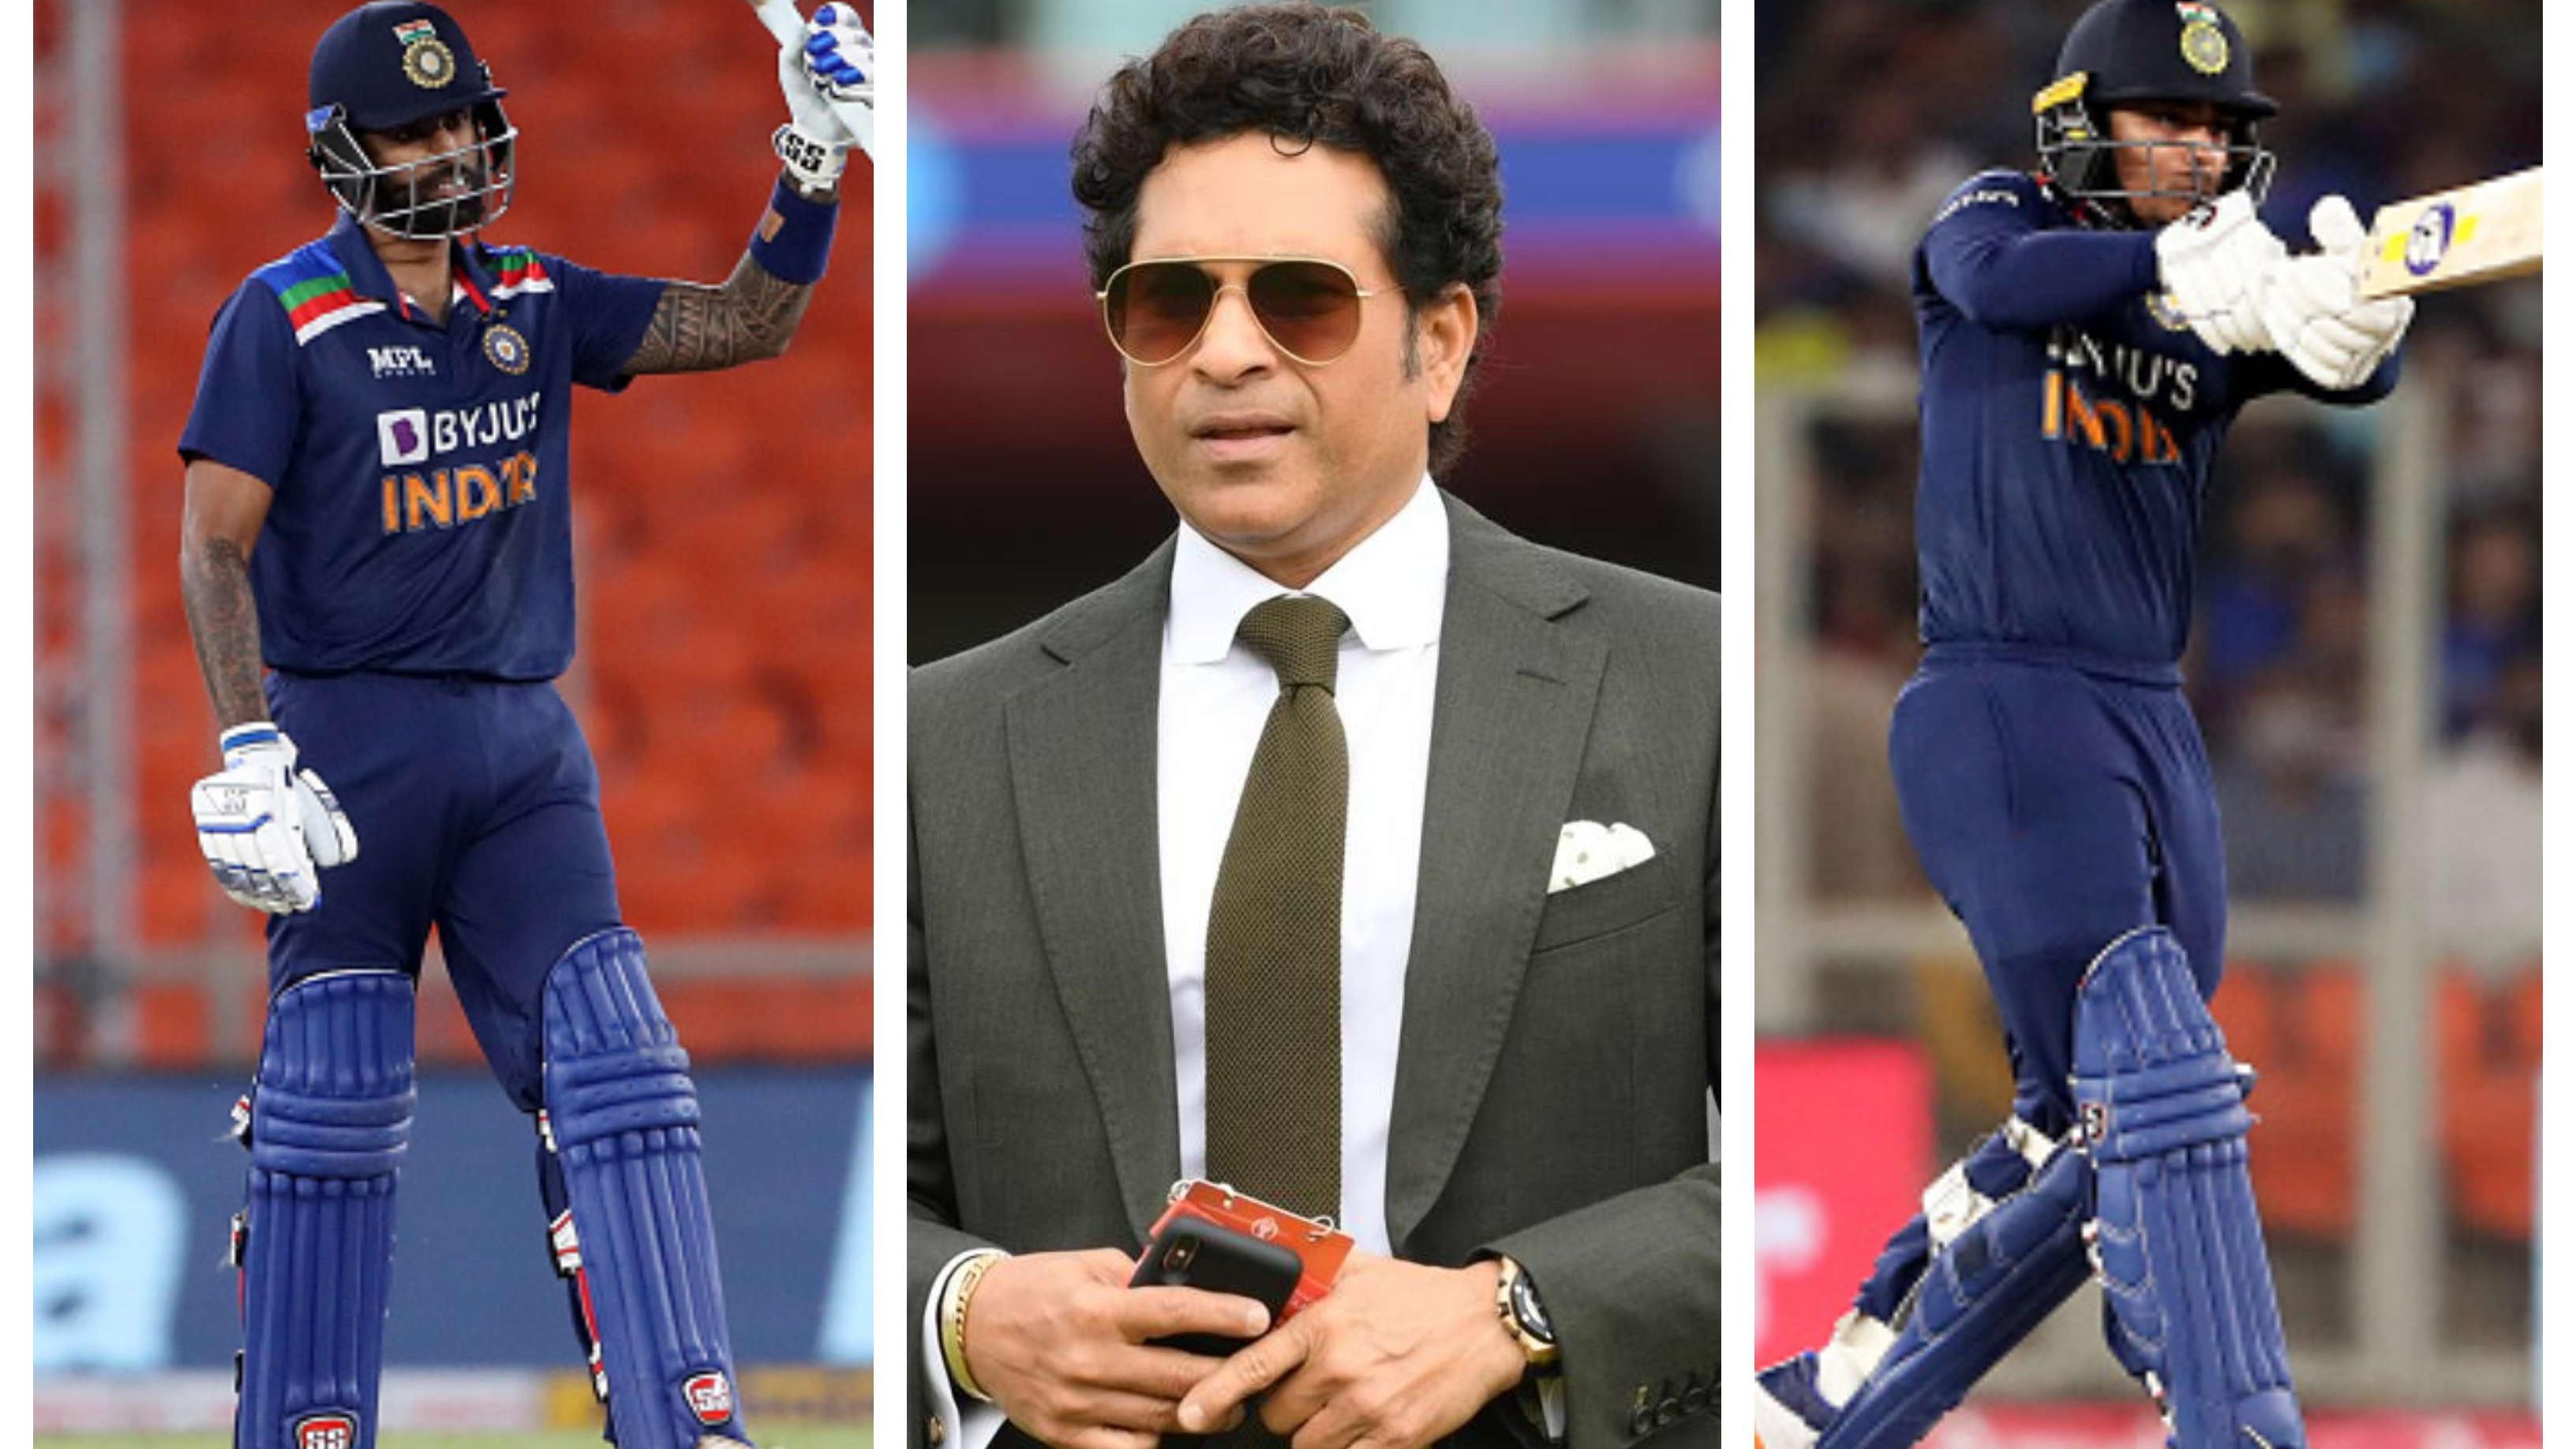 IND v ENG 2021: Sachin Tendulkar reckons Ishan Kishan, Suryakumar Yadav are ready to play T20 World Cup